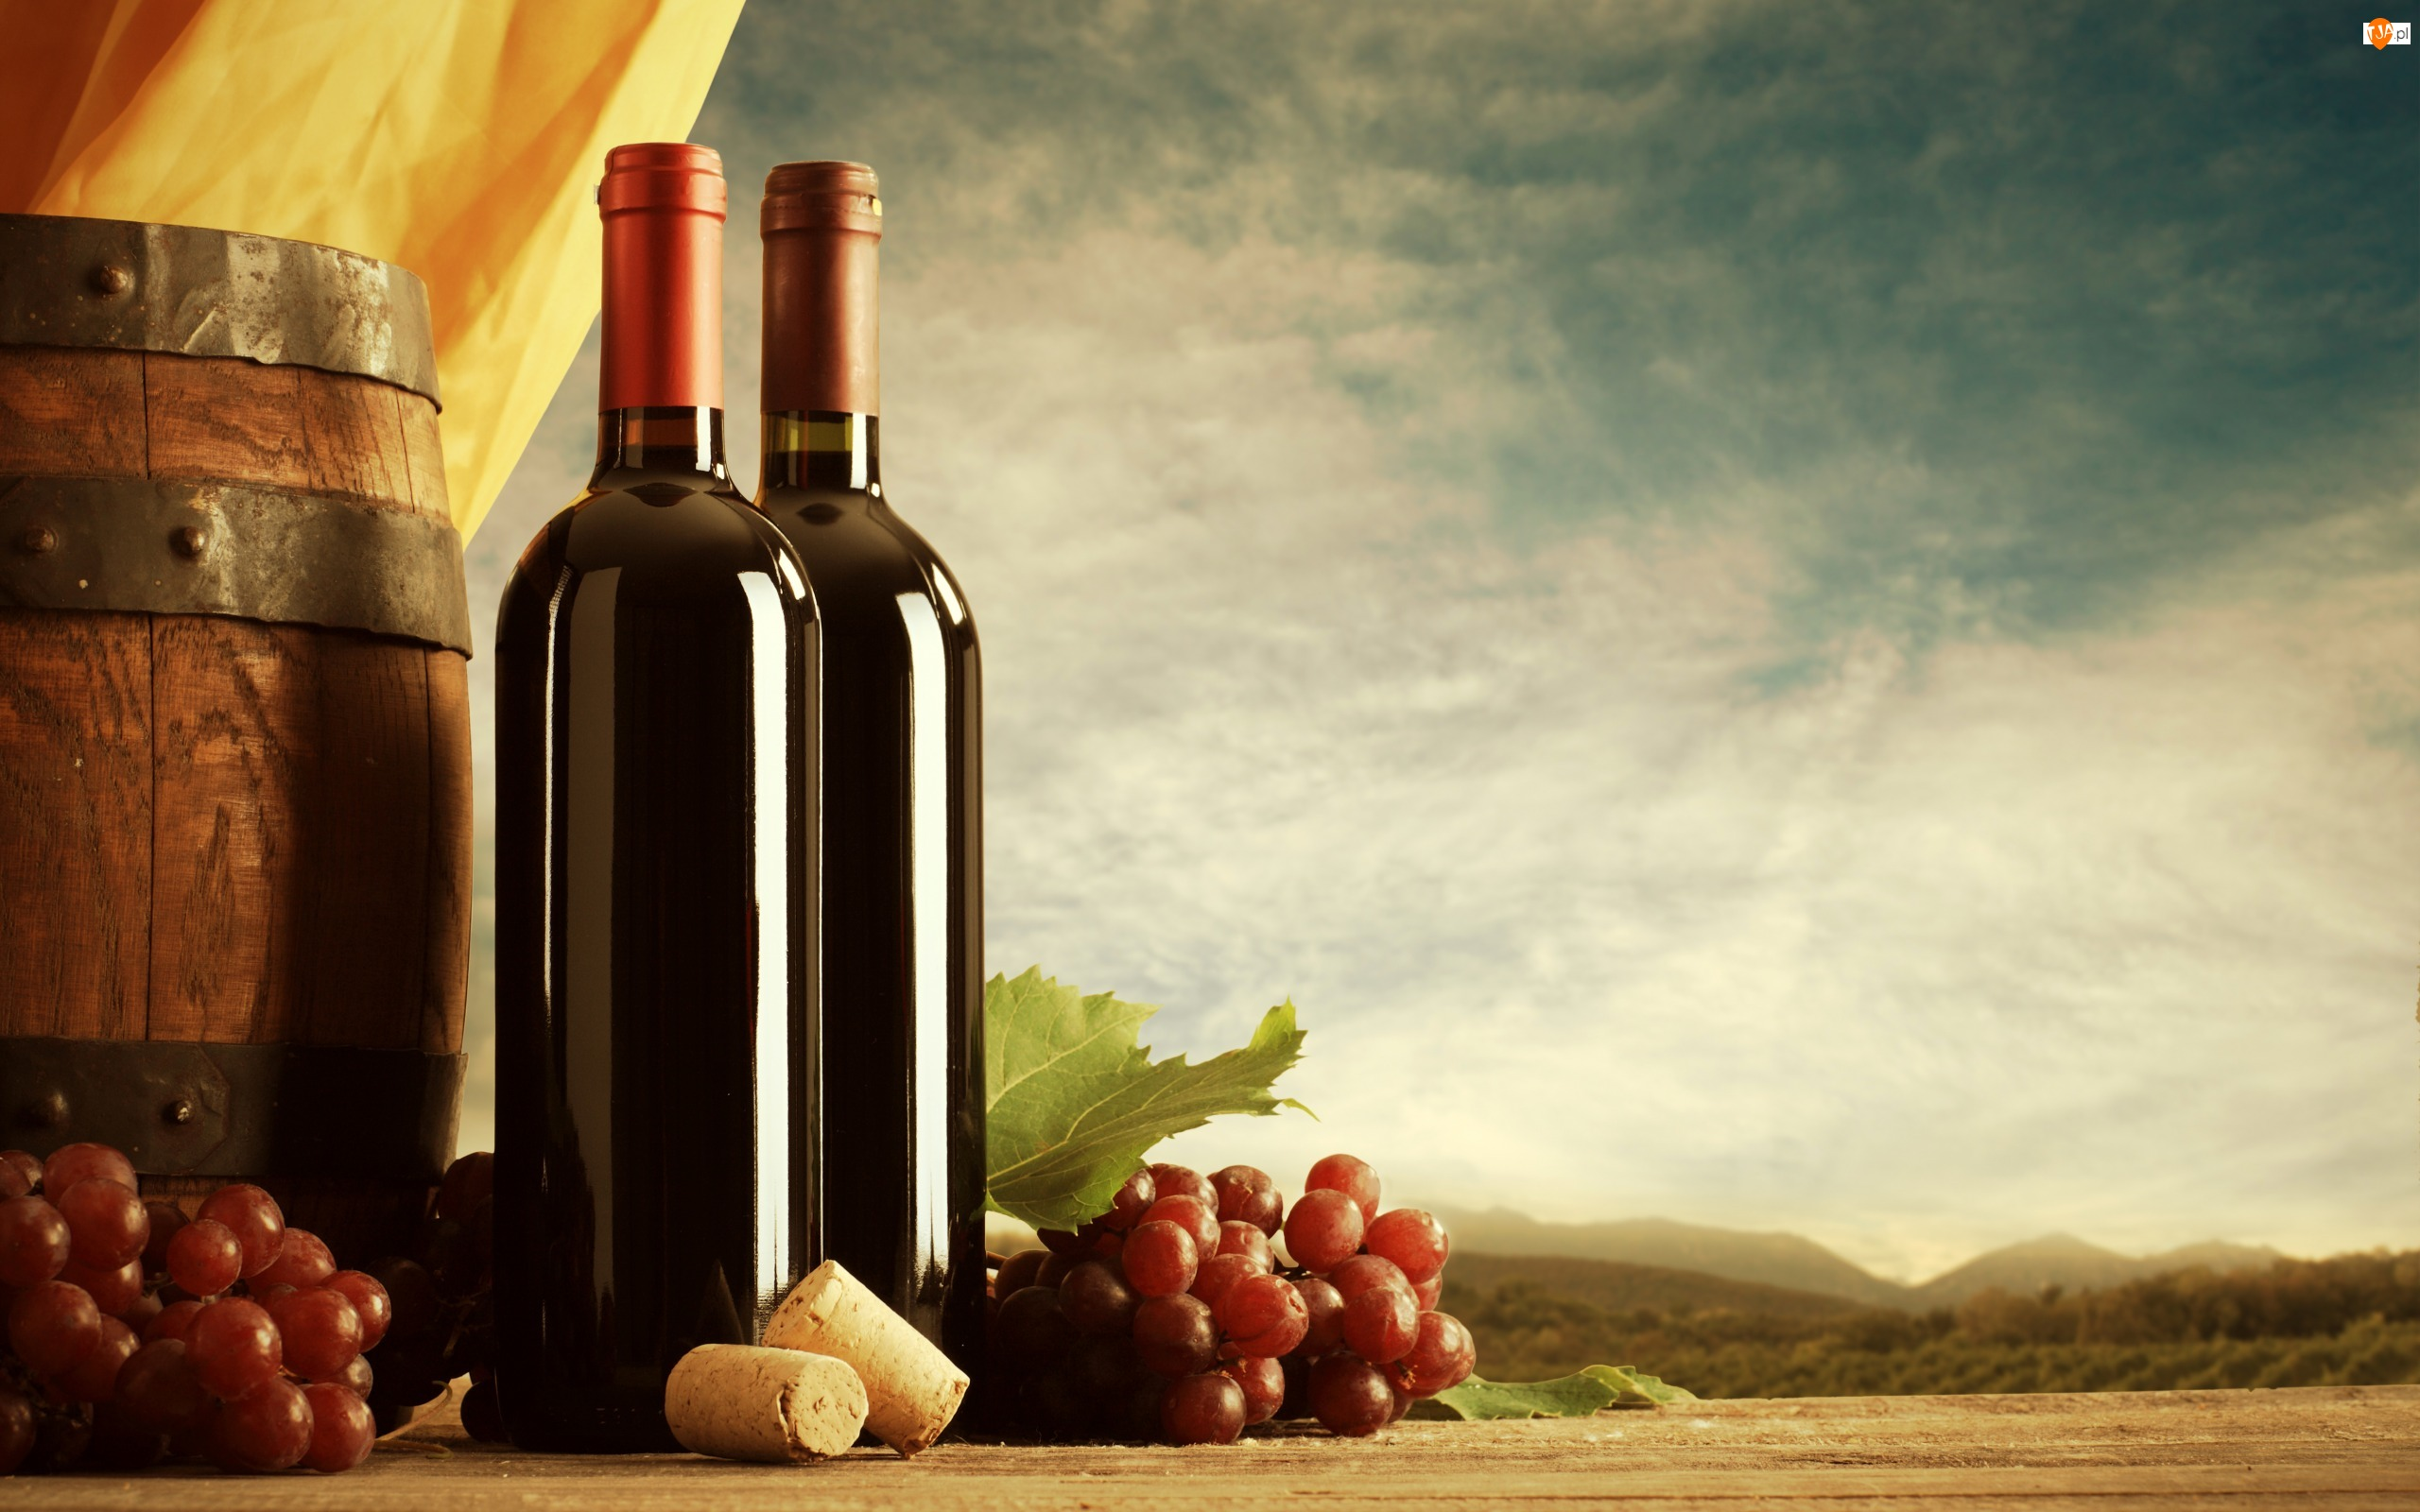 Winogrona, Beczka, Dwie, Wino, Butelki